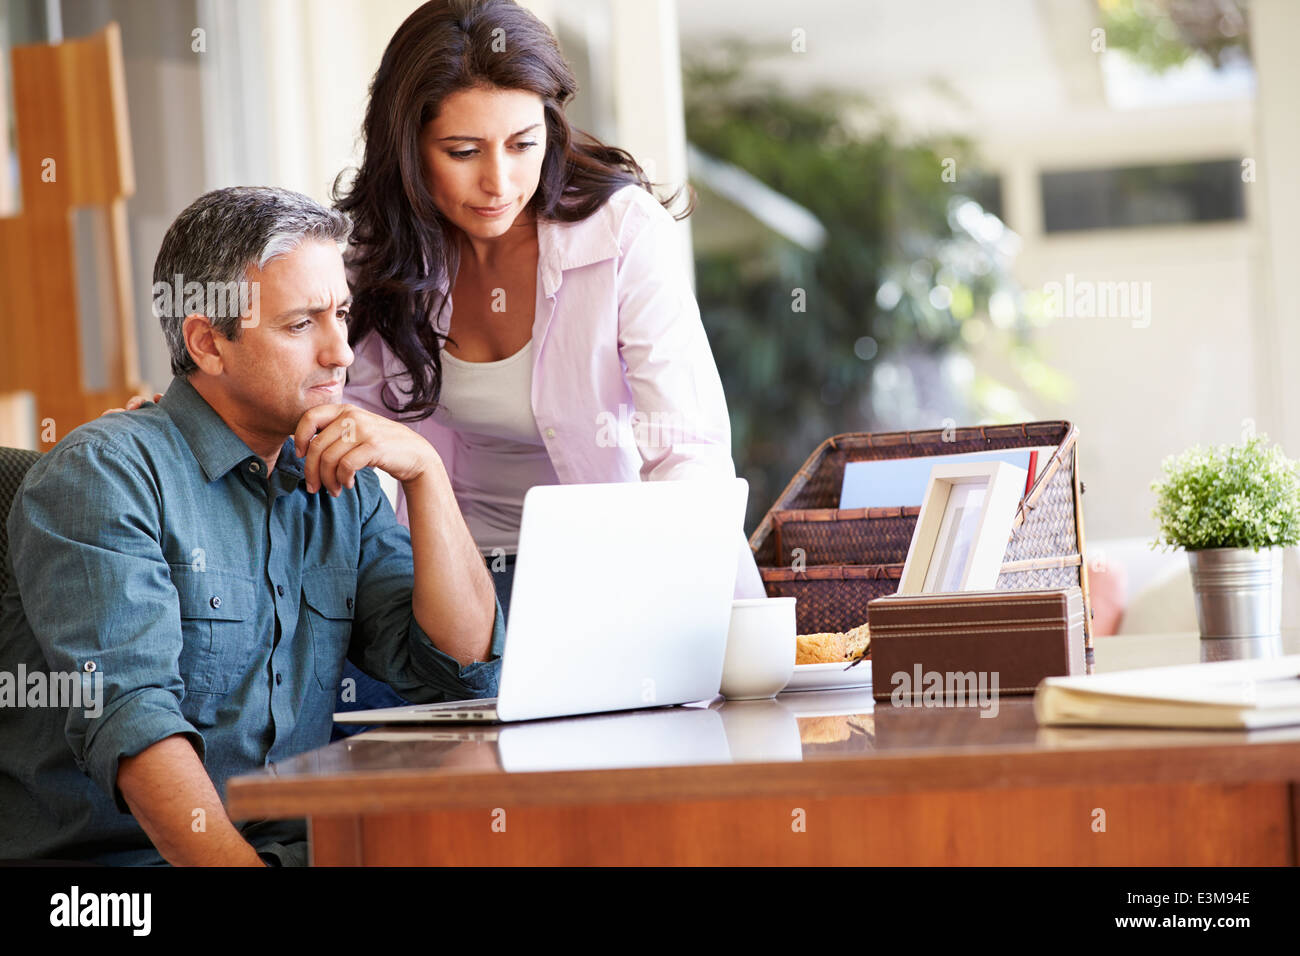 Worried Hispanic Couple Using Laptop On Desk At Home - Stock Image